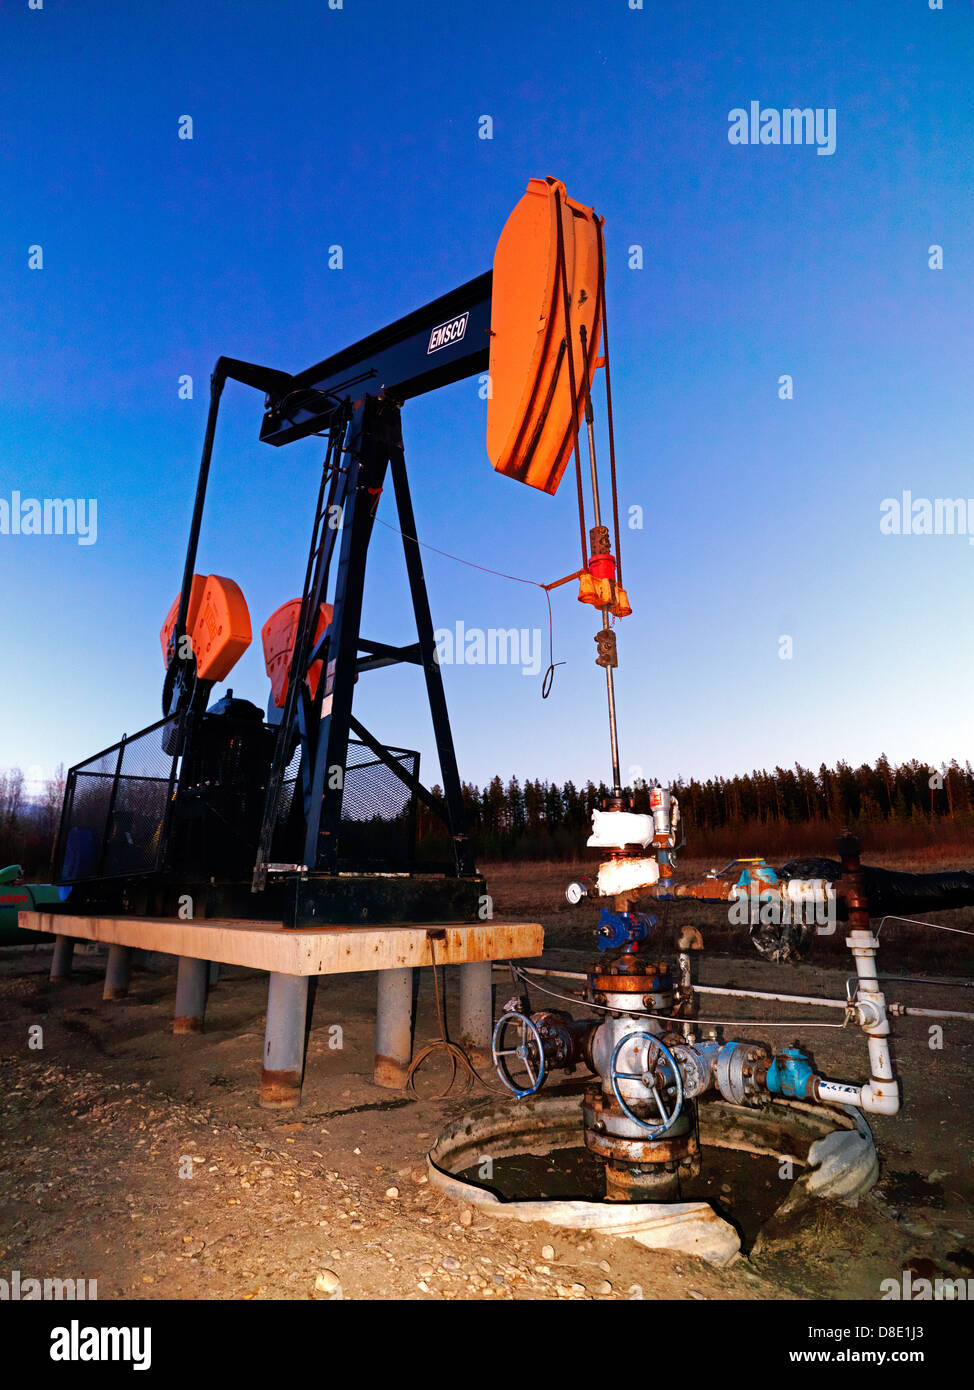 Paramount Resources compressor site at Kakwa in B.C. - Stock Image